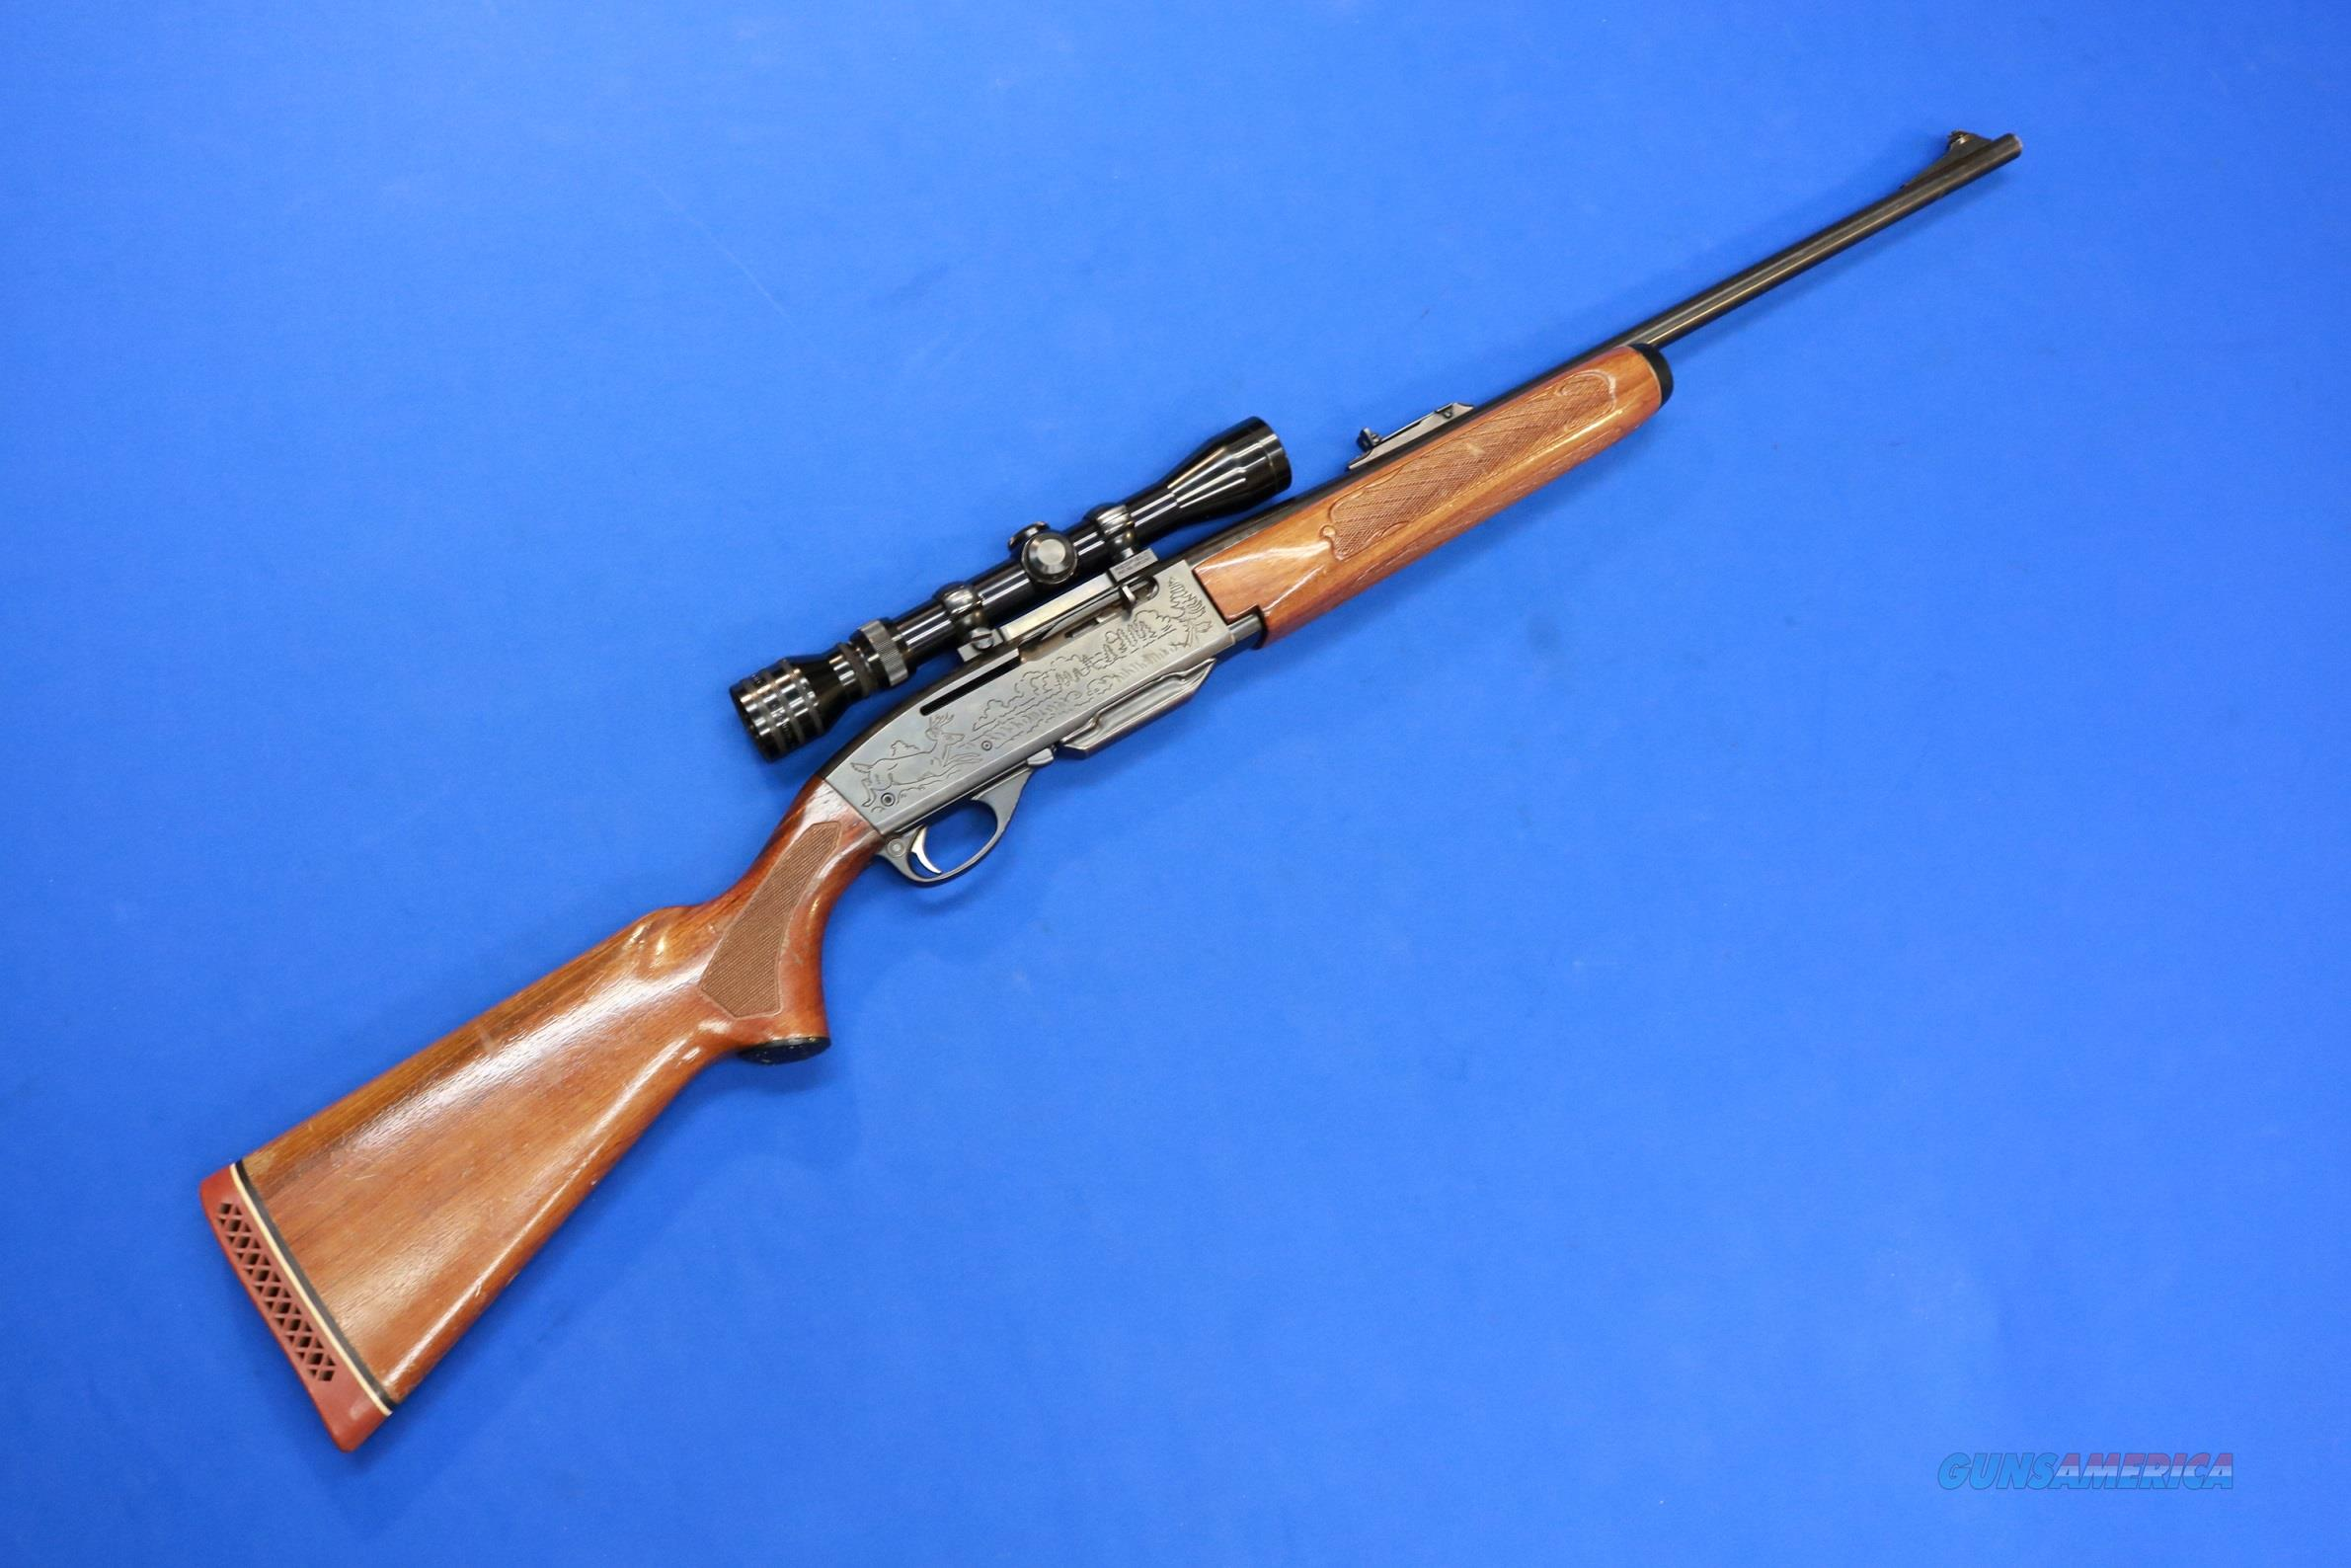 REMINGTON 742 WOODSMASTER .308 WIN w/REDFIELD 2-7  Guns > Rifles > Remington Rifles - Modern > Other